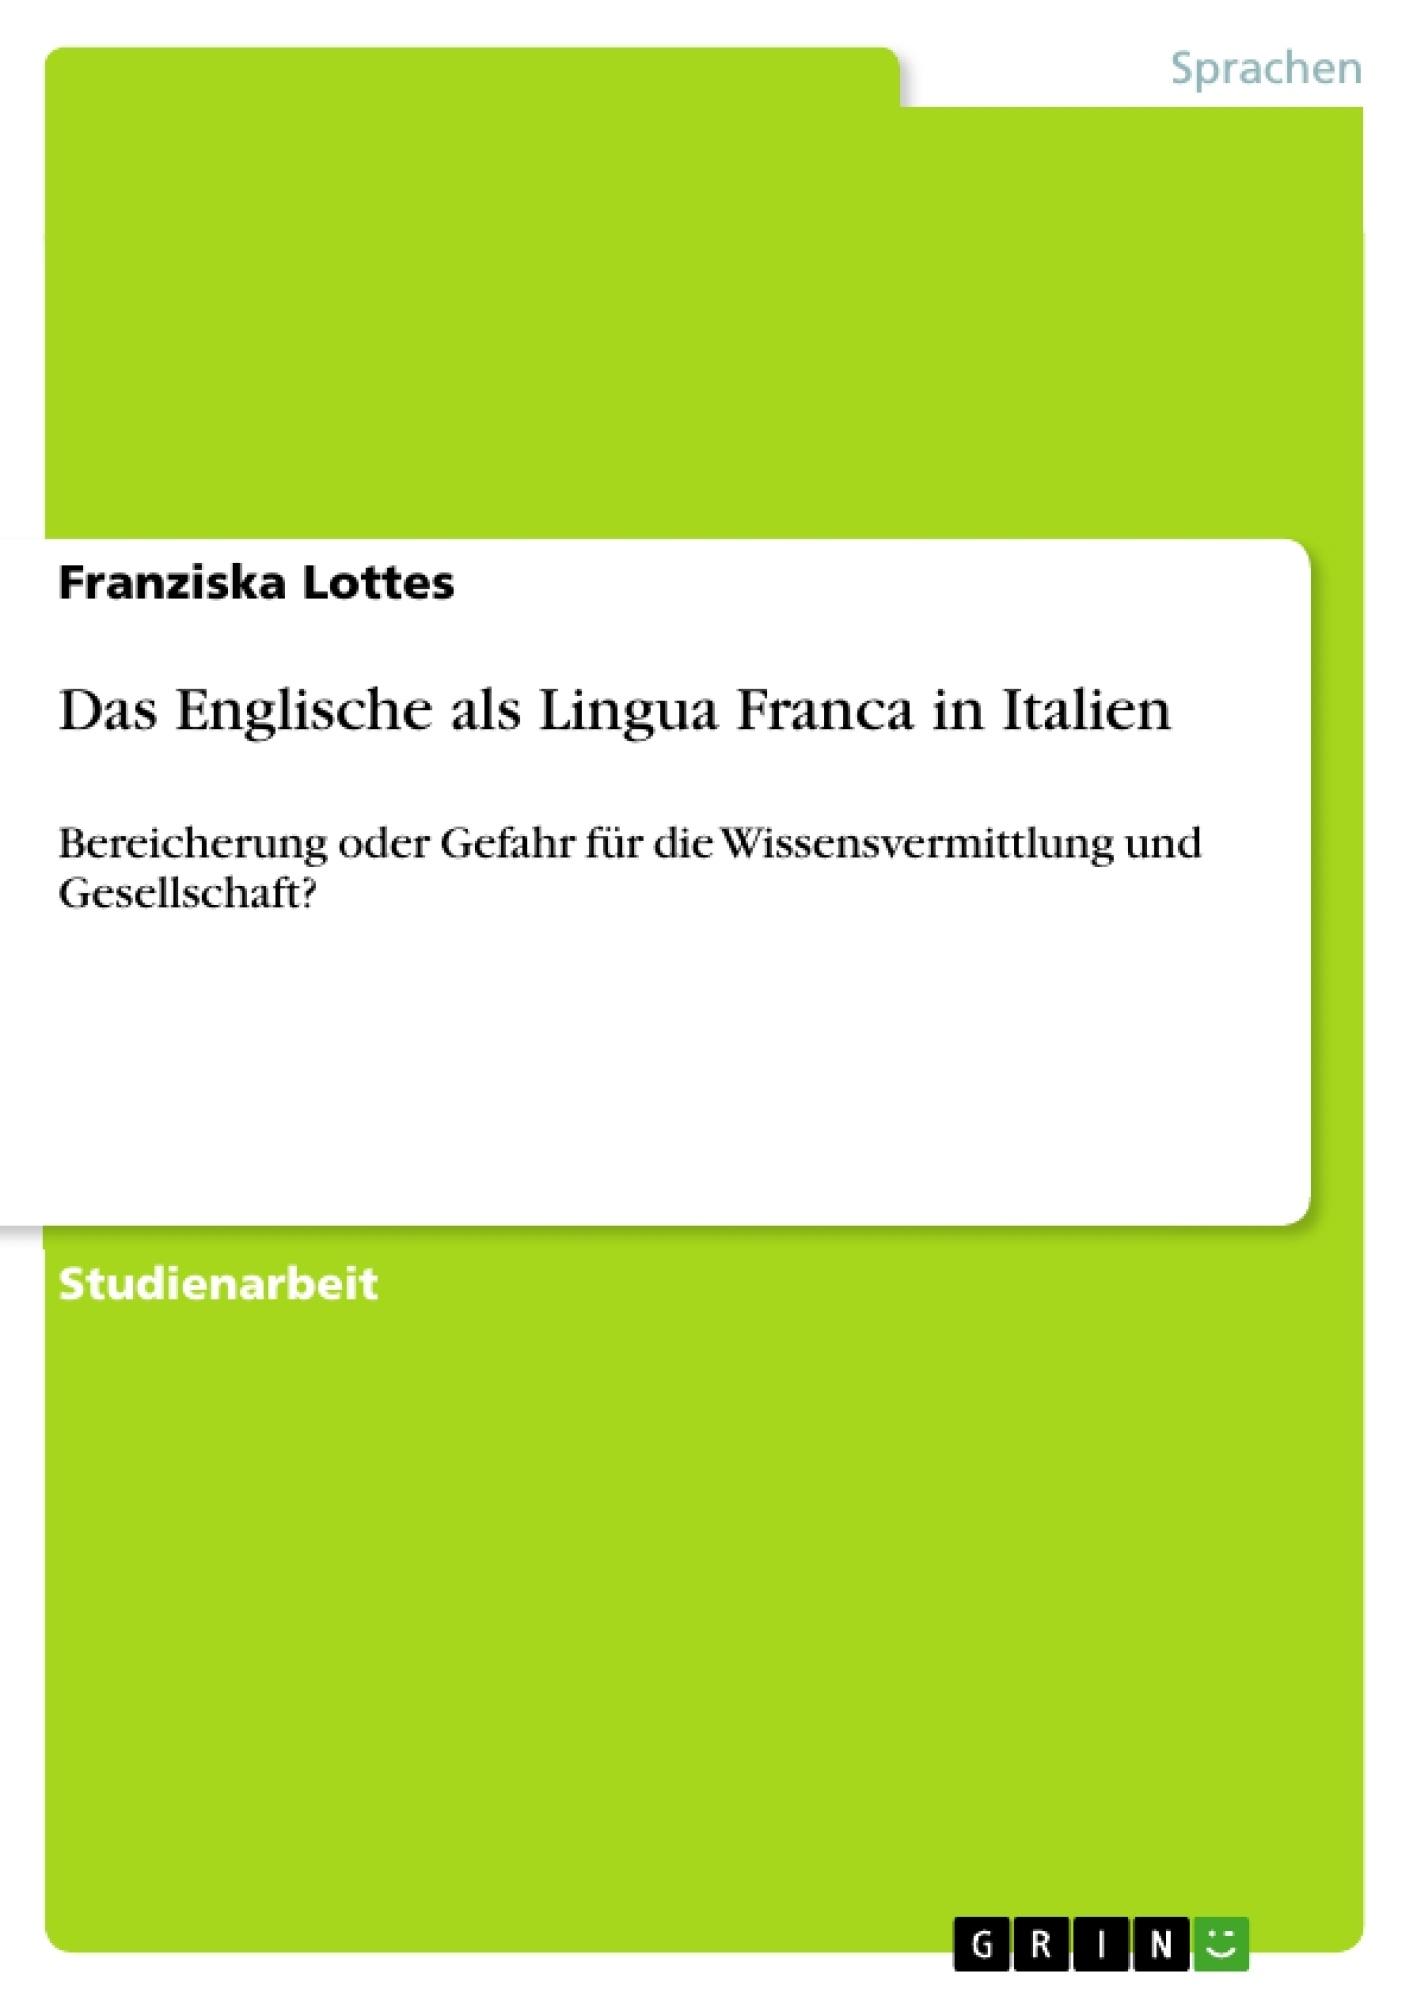 Titel: Das Englische als Lingua Franca in Italien